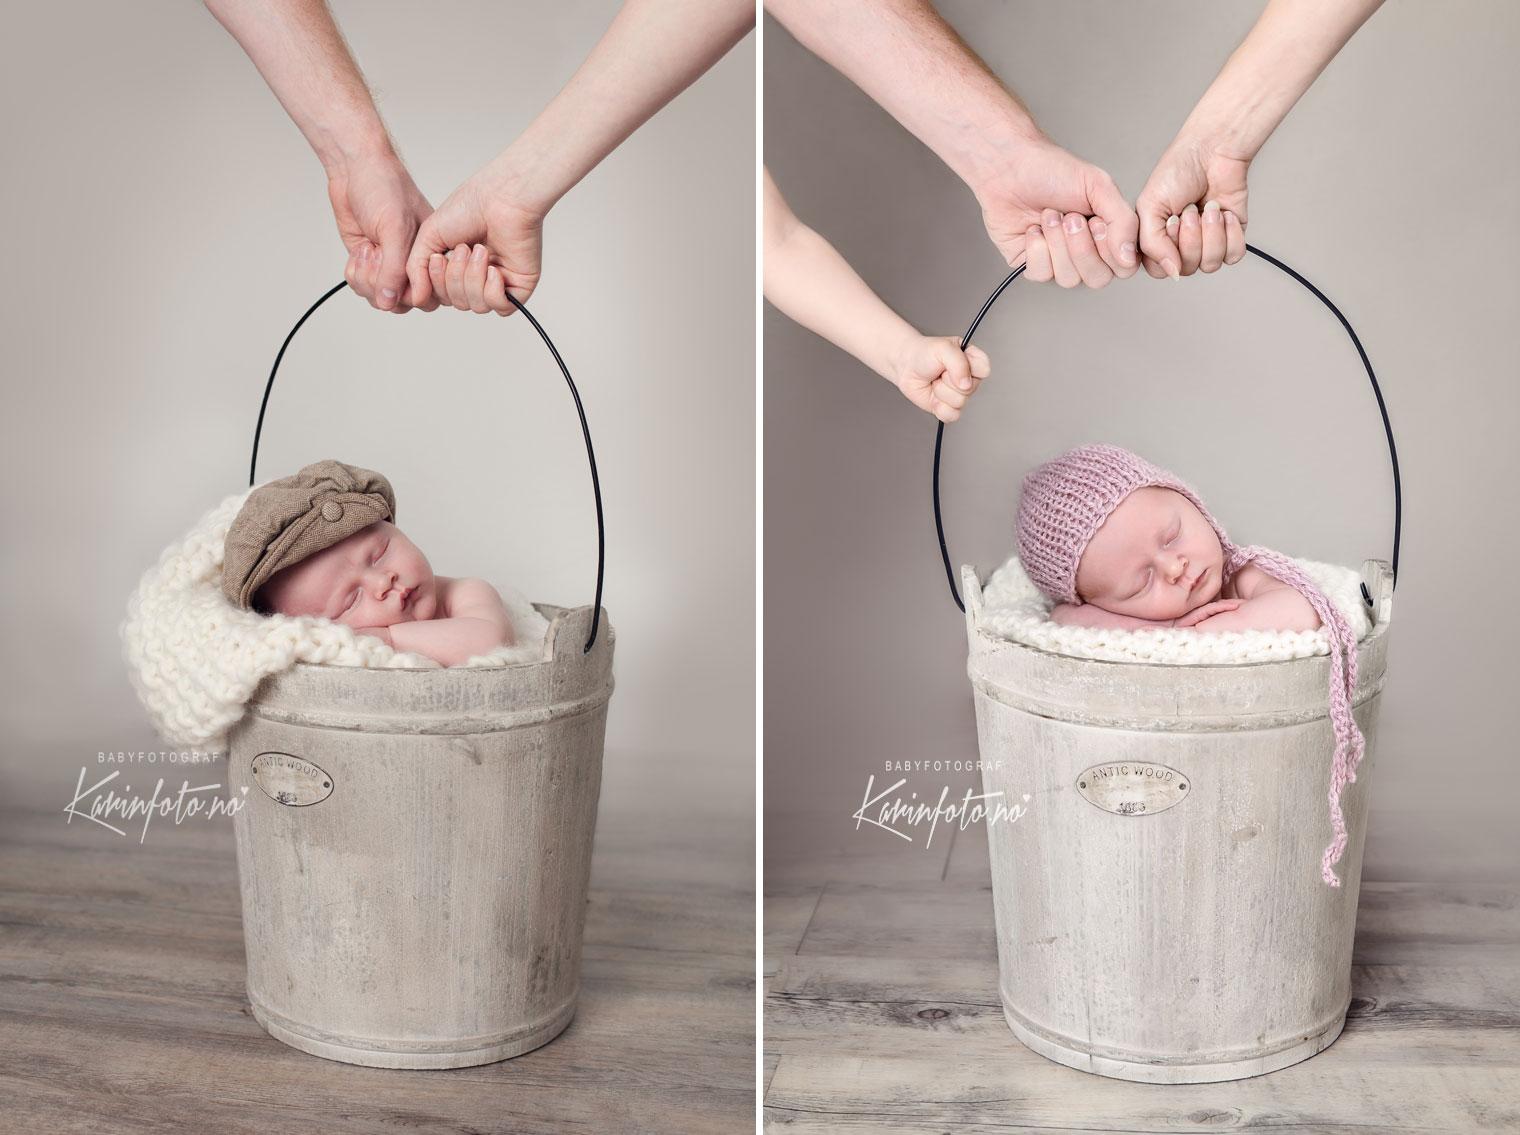 Familiefotografering,familiefoto,familie,nyfødtfotografering,fotograf Karin Pedersen,Karinfoto